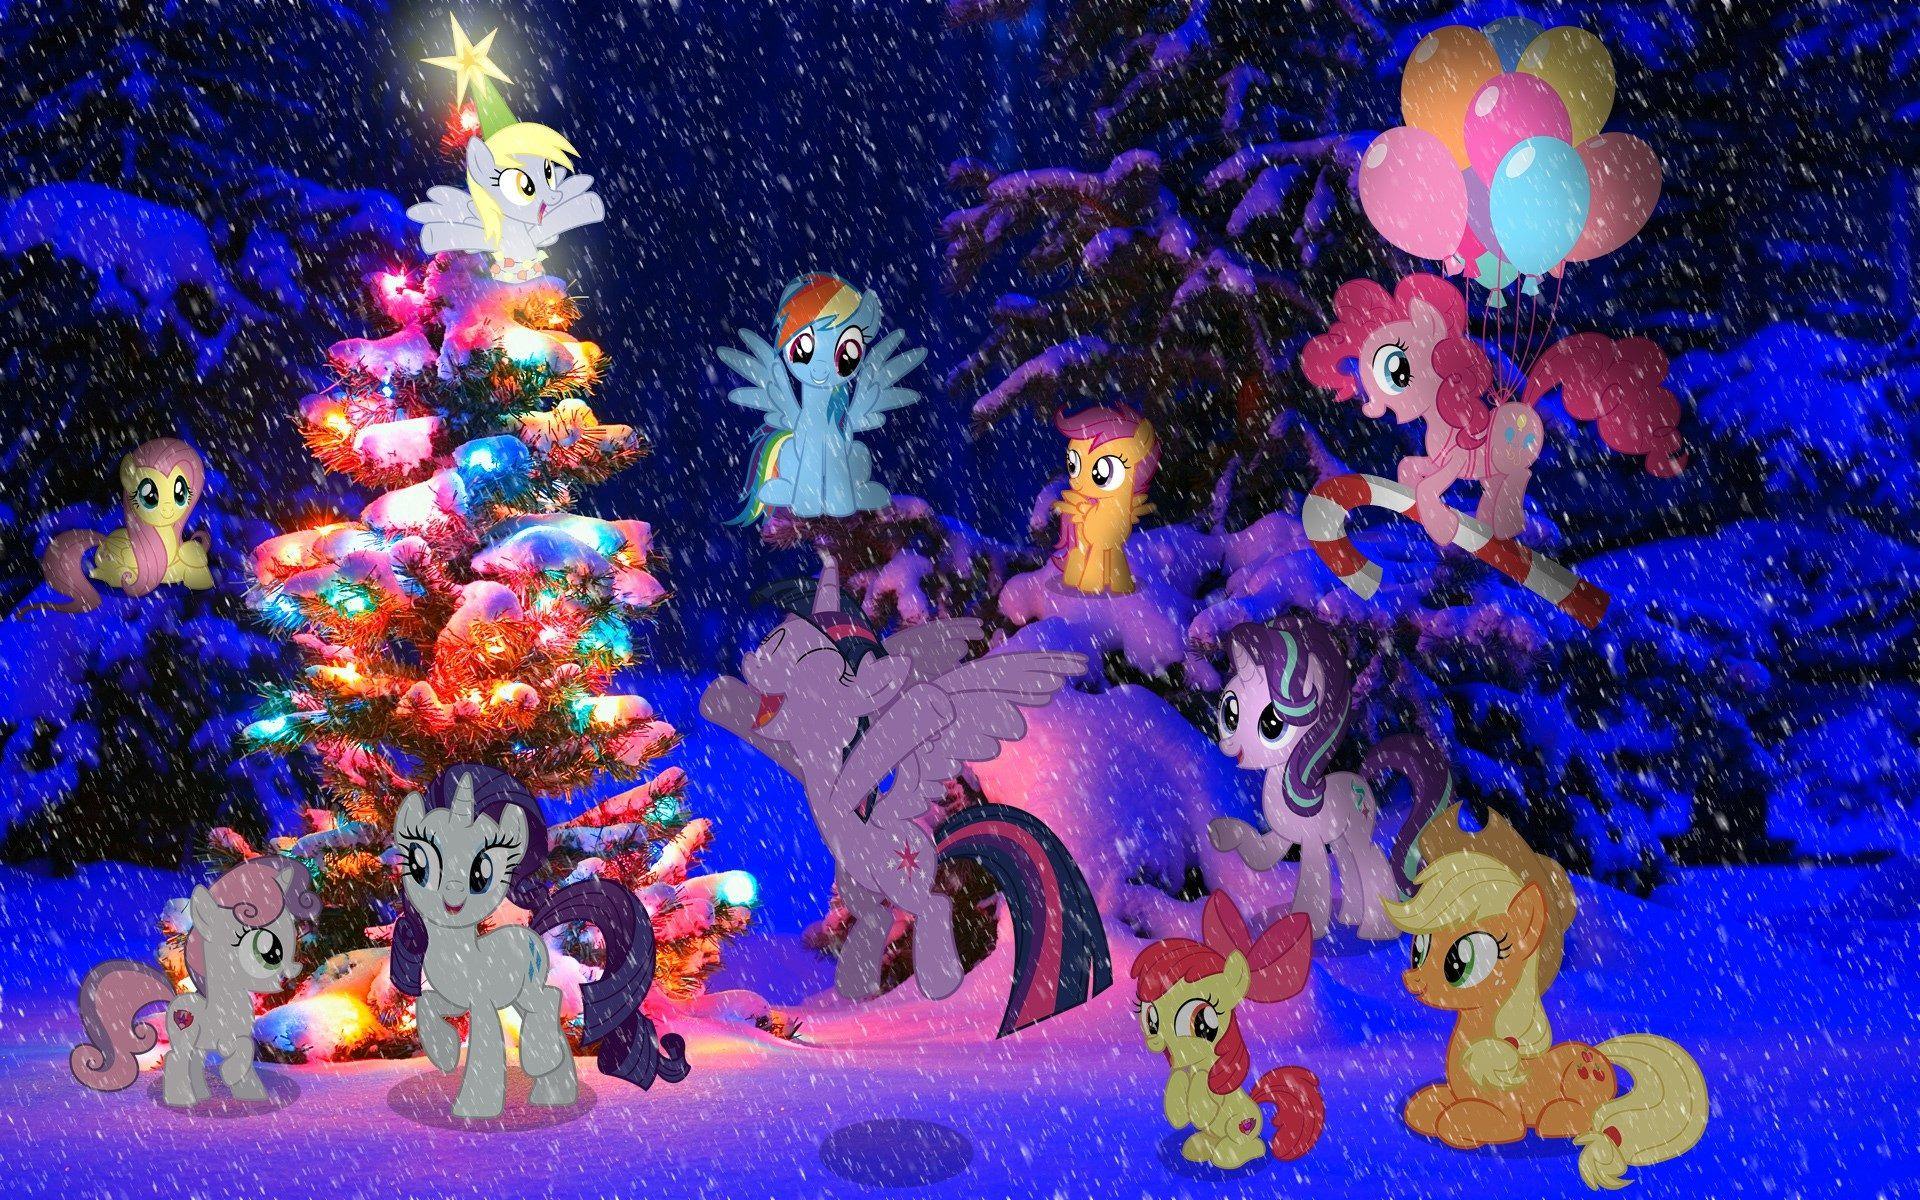 Christmas Wallpaper Hd Download Free Wallpapers Backgrounds Christmas Wallpaper Hd Christmas Wallpaper Free Christmas Wallpaper